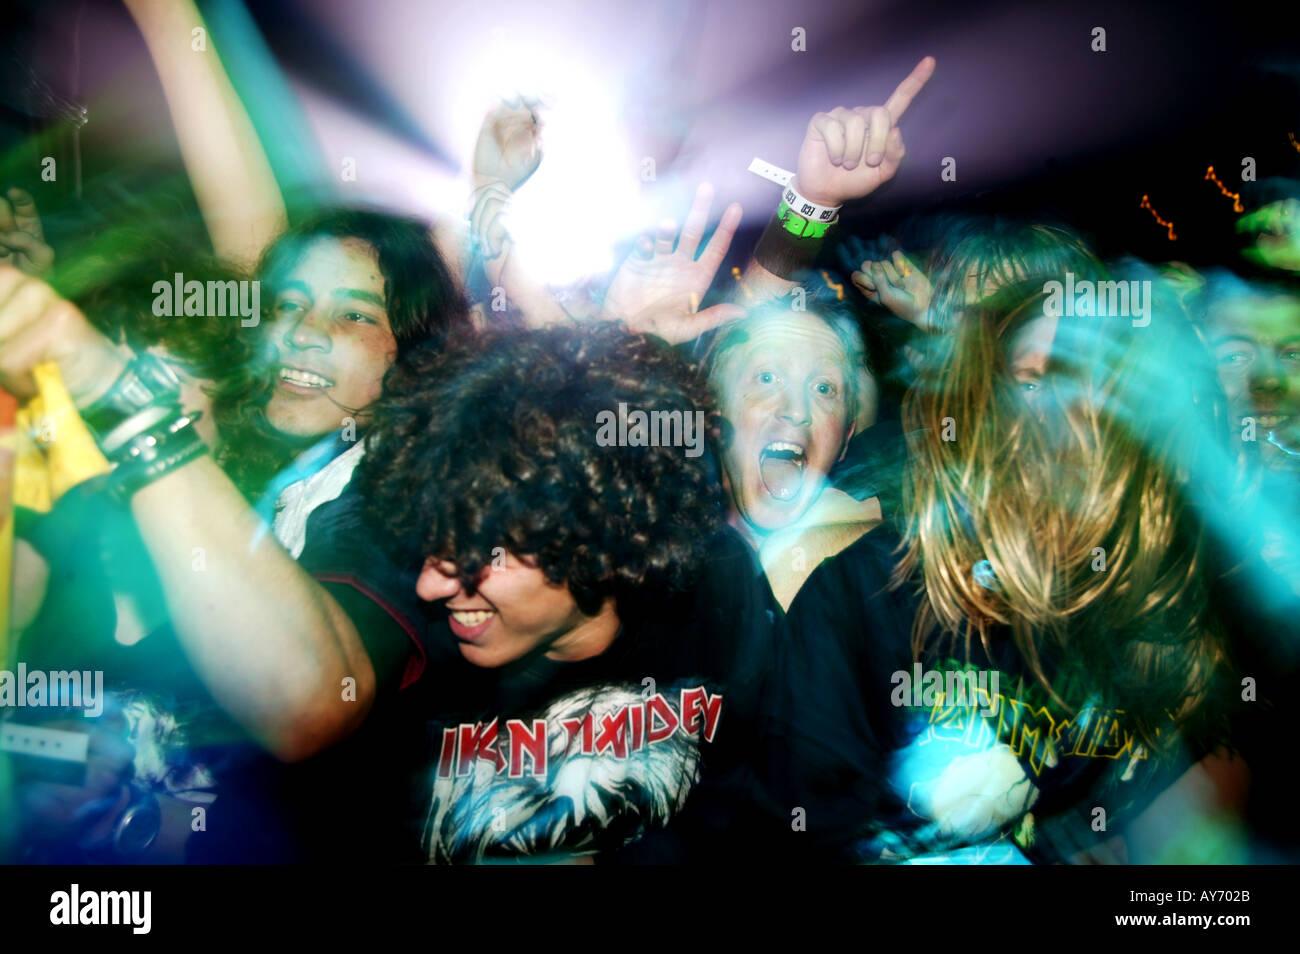 concert crowd 04 - Stock Image